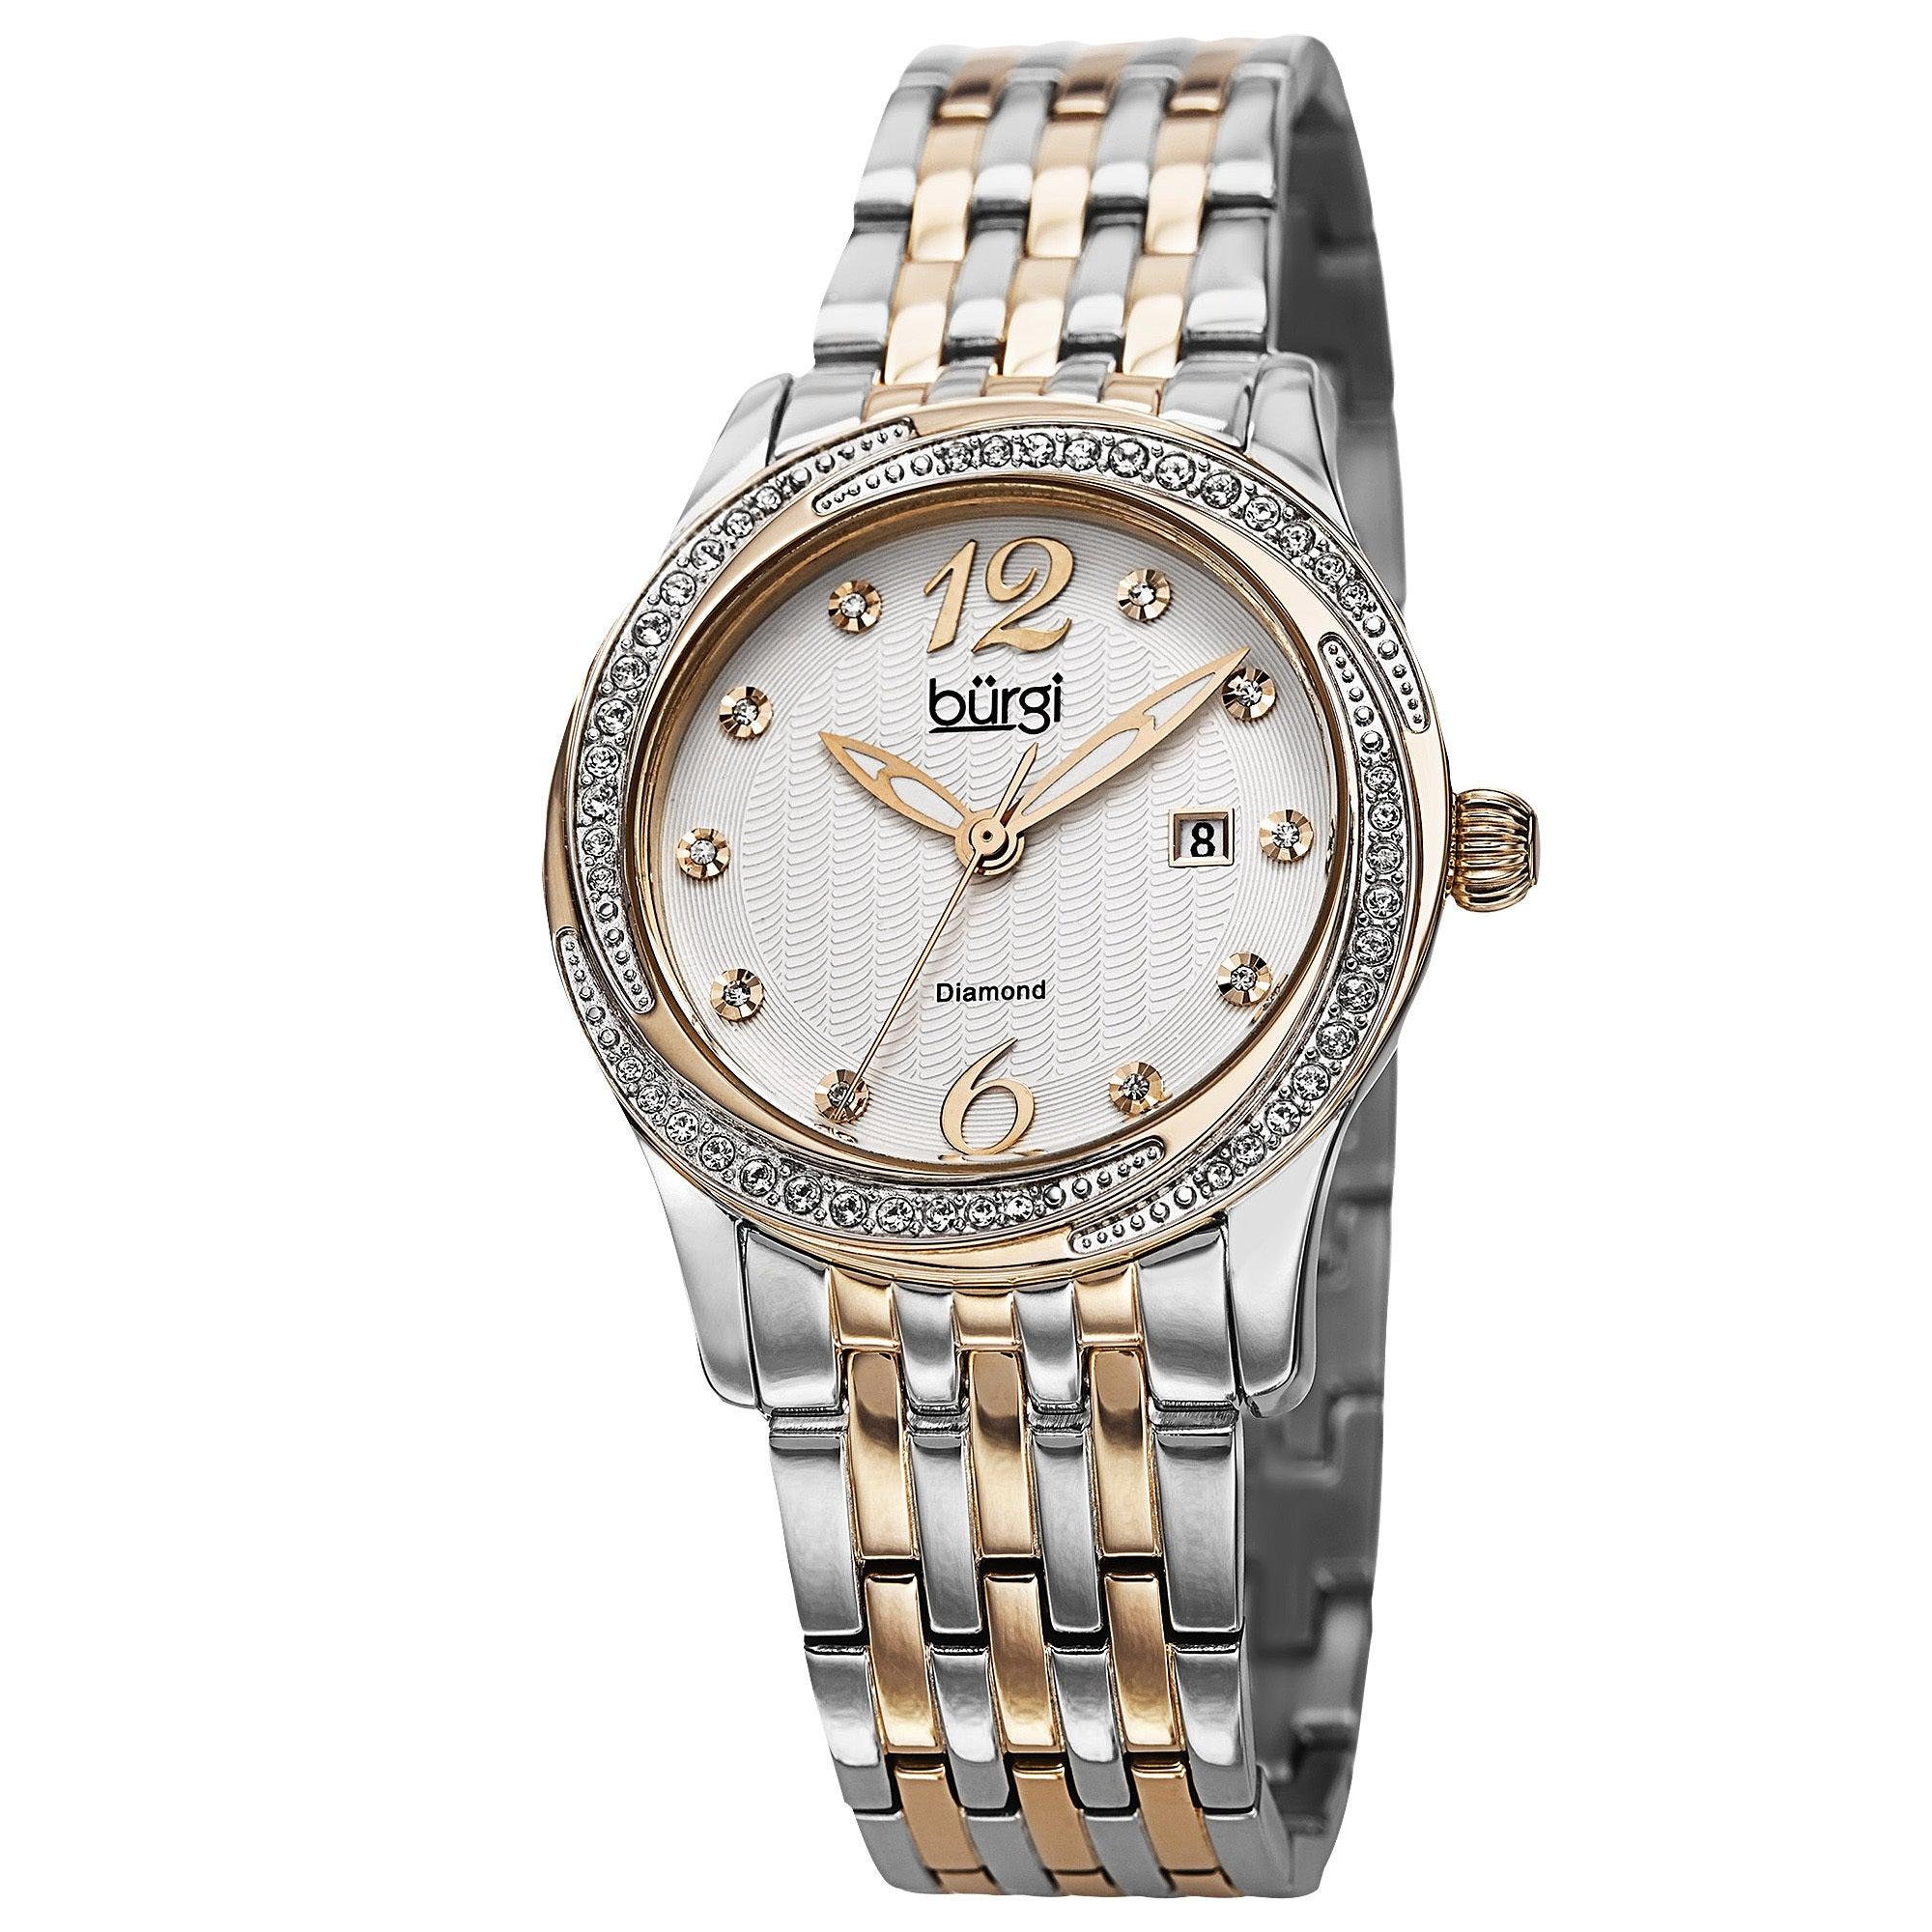 Dial Bracelet Dial Bracelet Watch